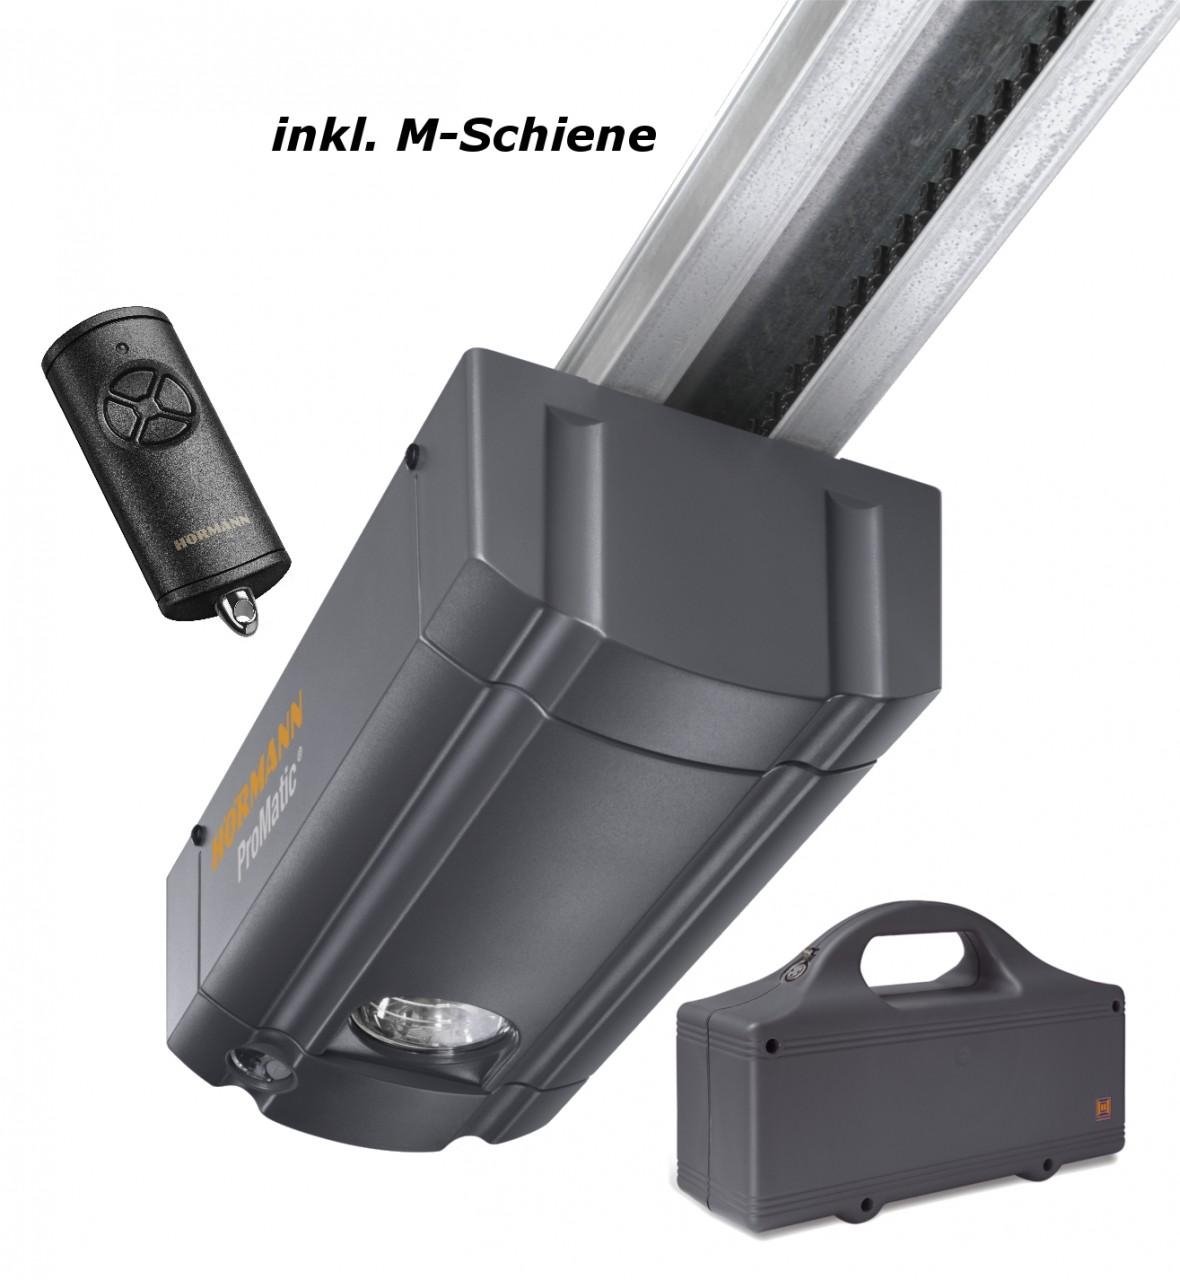 Hörmann ProMatic Akku mit M-Schiene